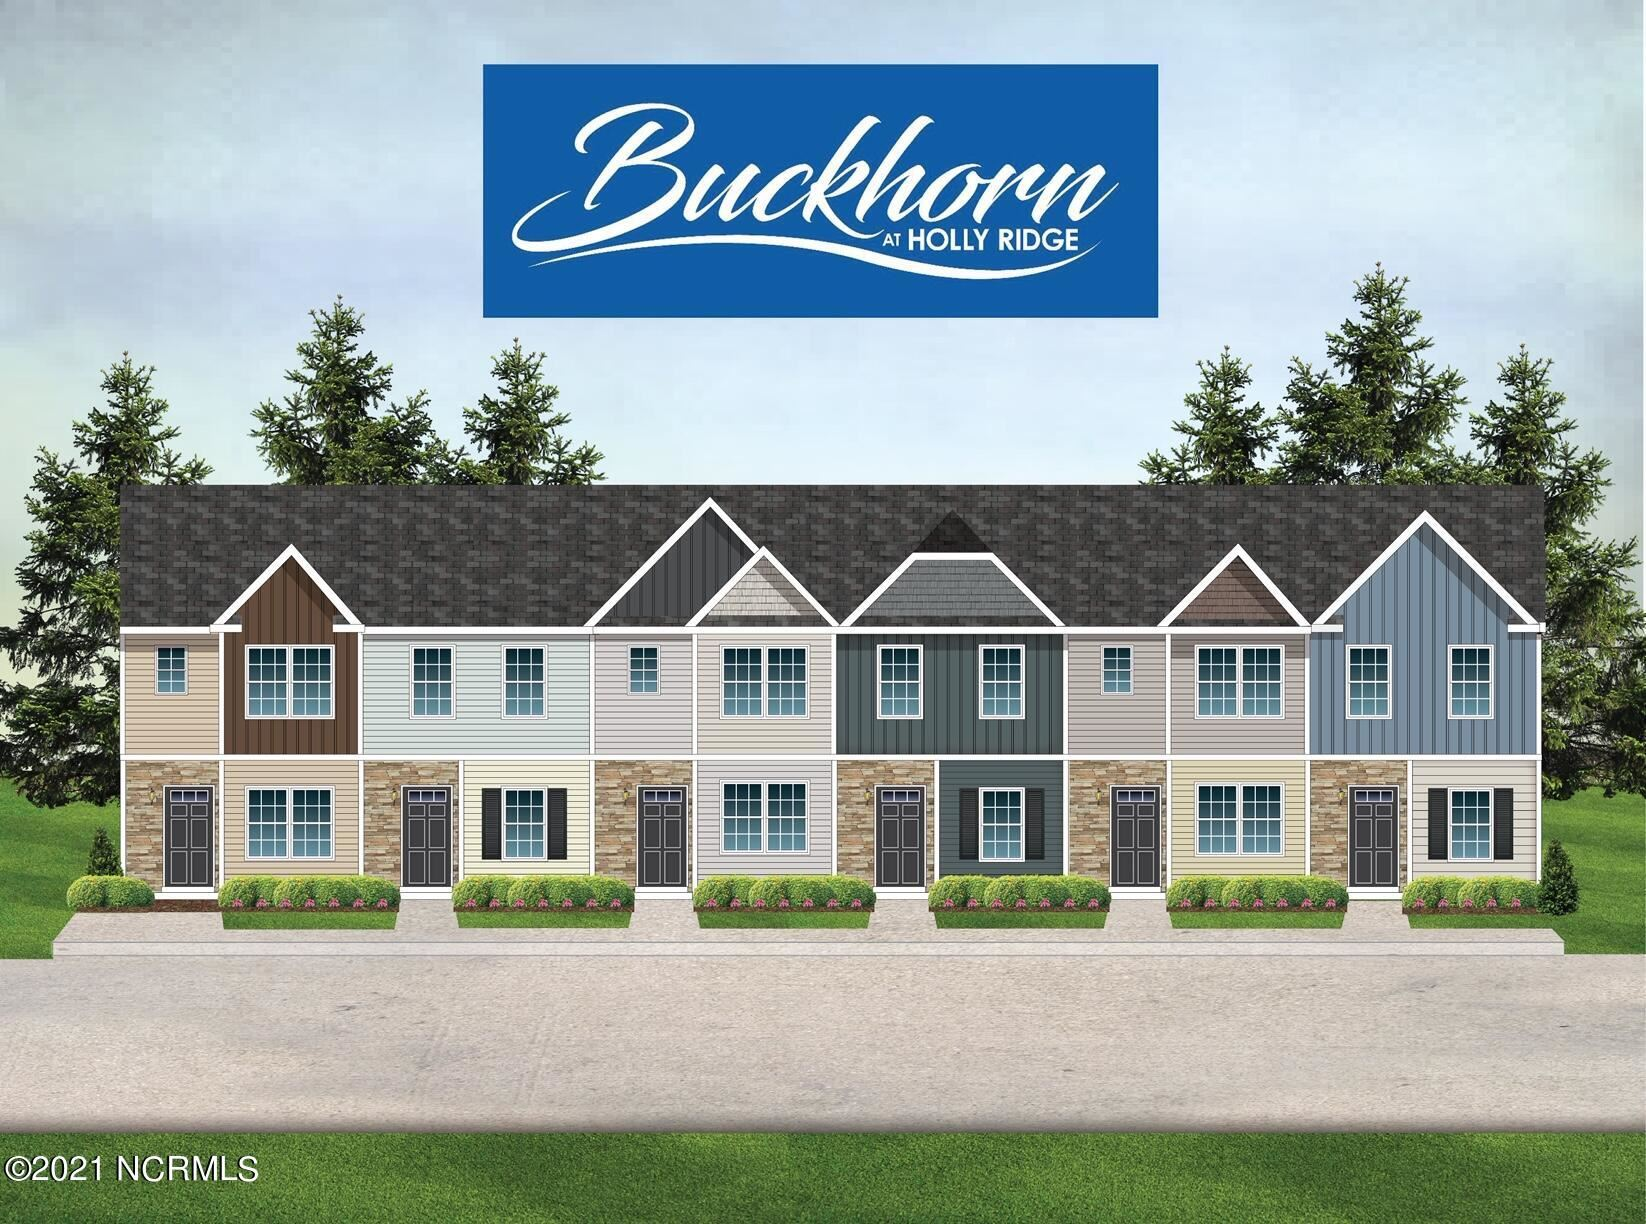 Photo of 190 Buckhorn Ave., Holly Ridge, NC 28445 (MLS # 100294394)